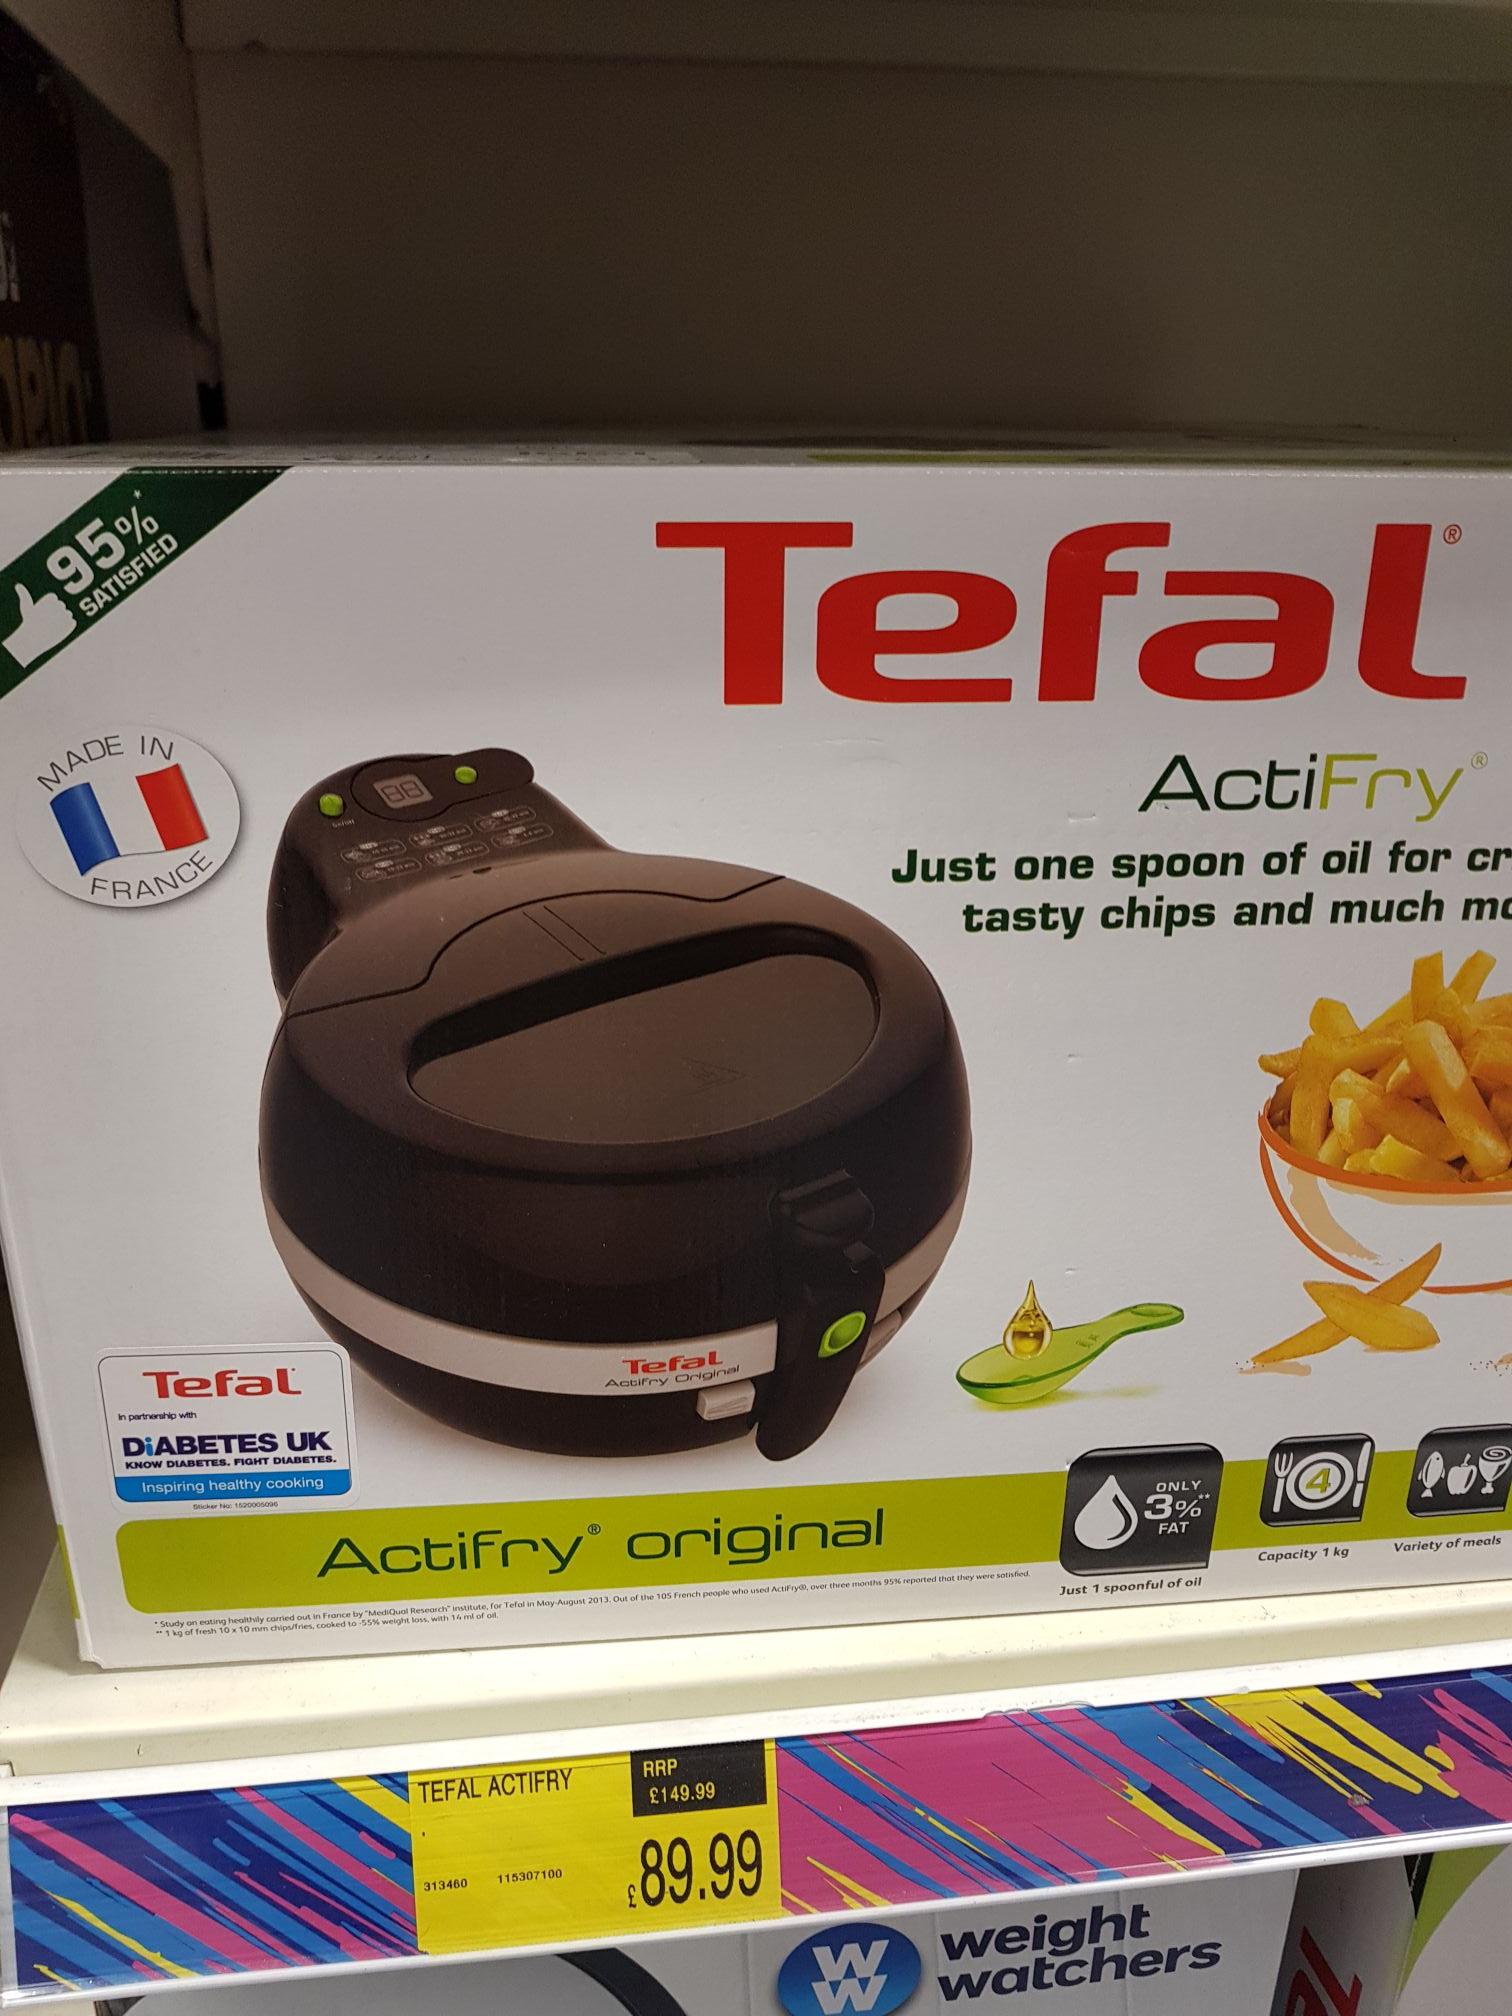 Tefal Actifry Original 1kg version instore B and M (Didcot) - £89.99